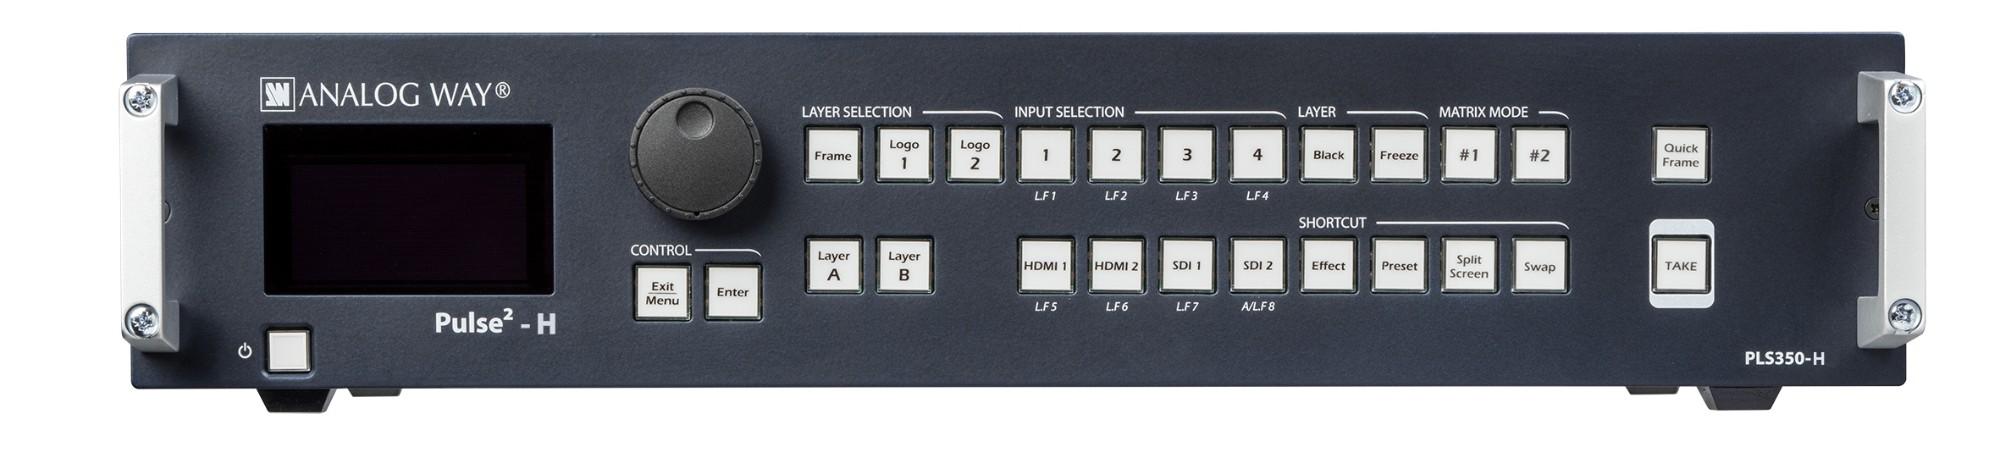 Analog Way Pulse² - H Media presentation matrix switcher Built-in display 155 W